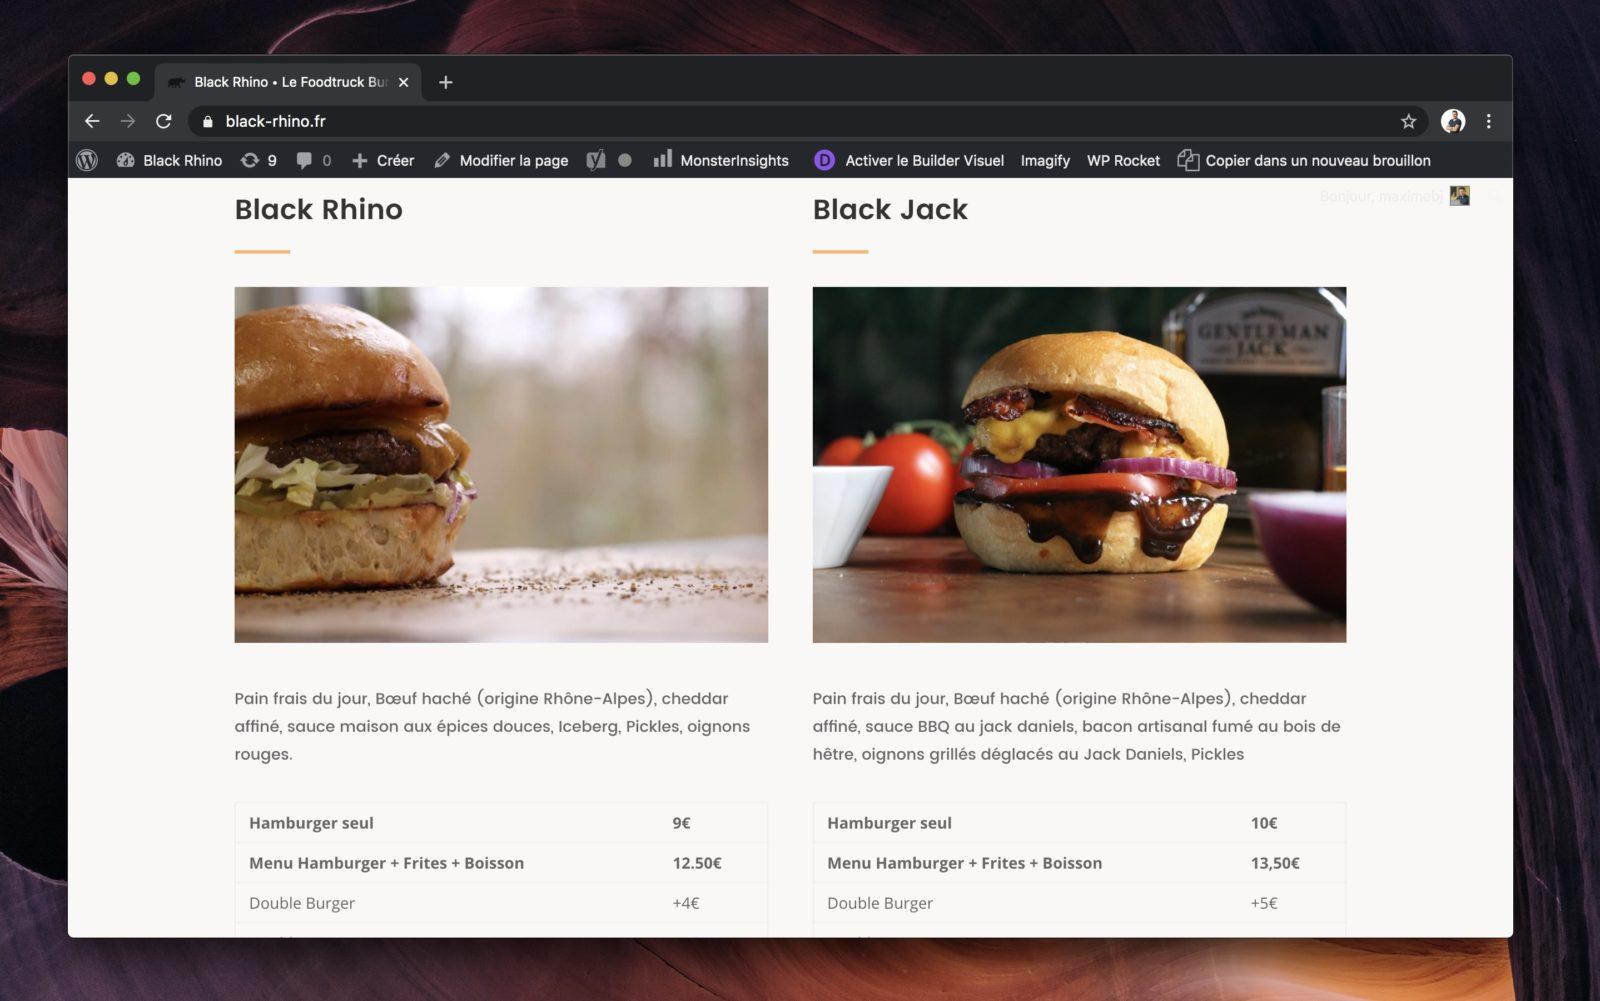 Capture d'écran de la carte des menus du Black Rhino